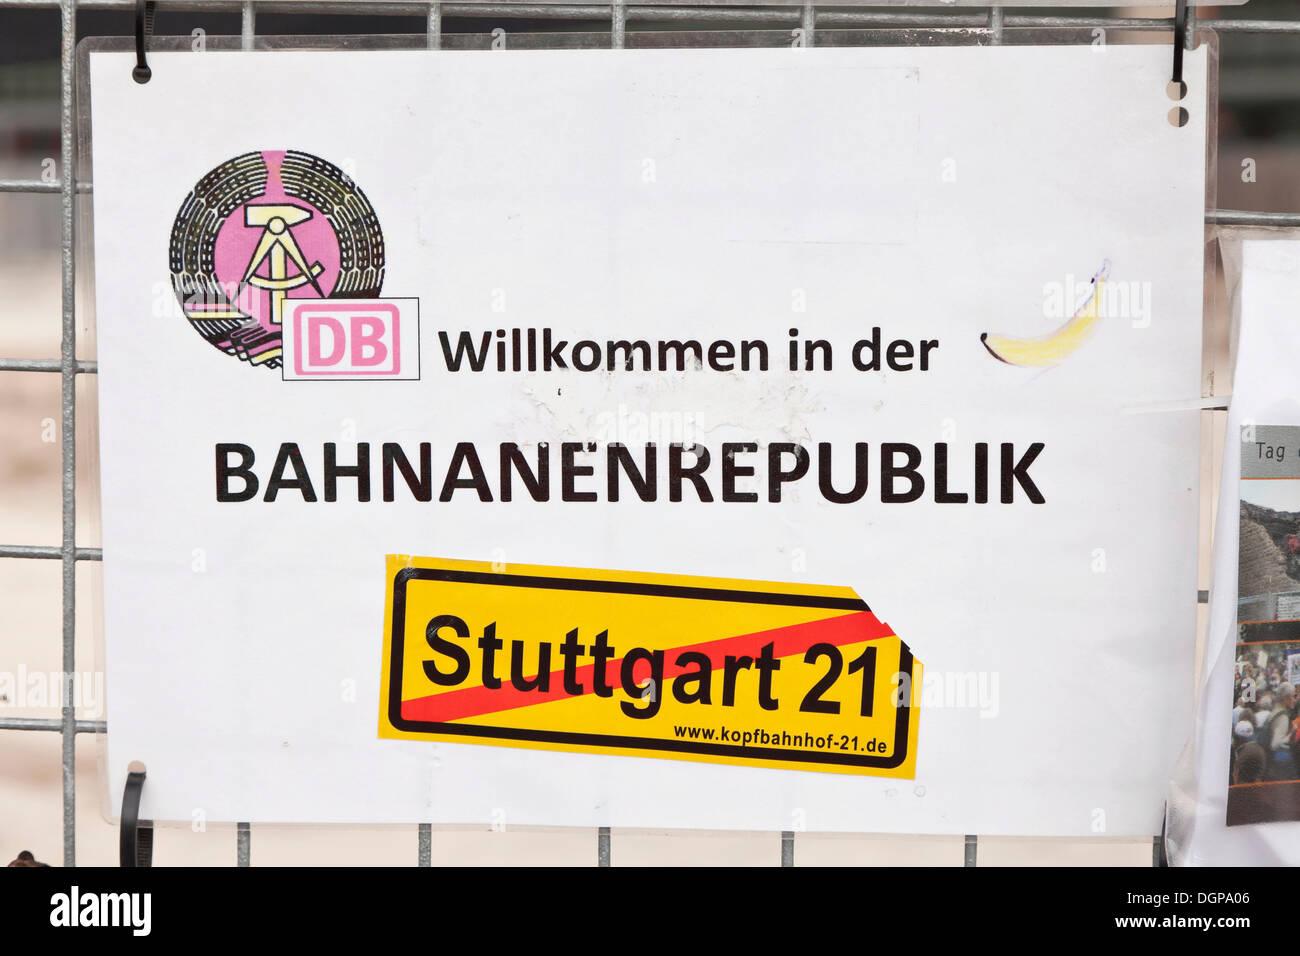 Protest poster 'Willkommen in der Bananenrepublik', German for 'welcome to the banana republic', protest against the Stuttgart - Stock Image